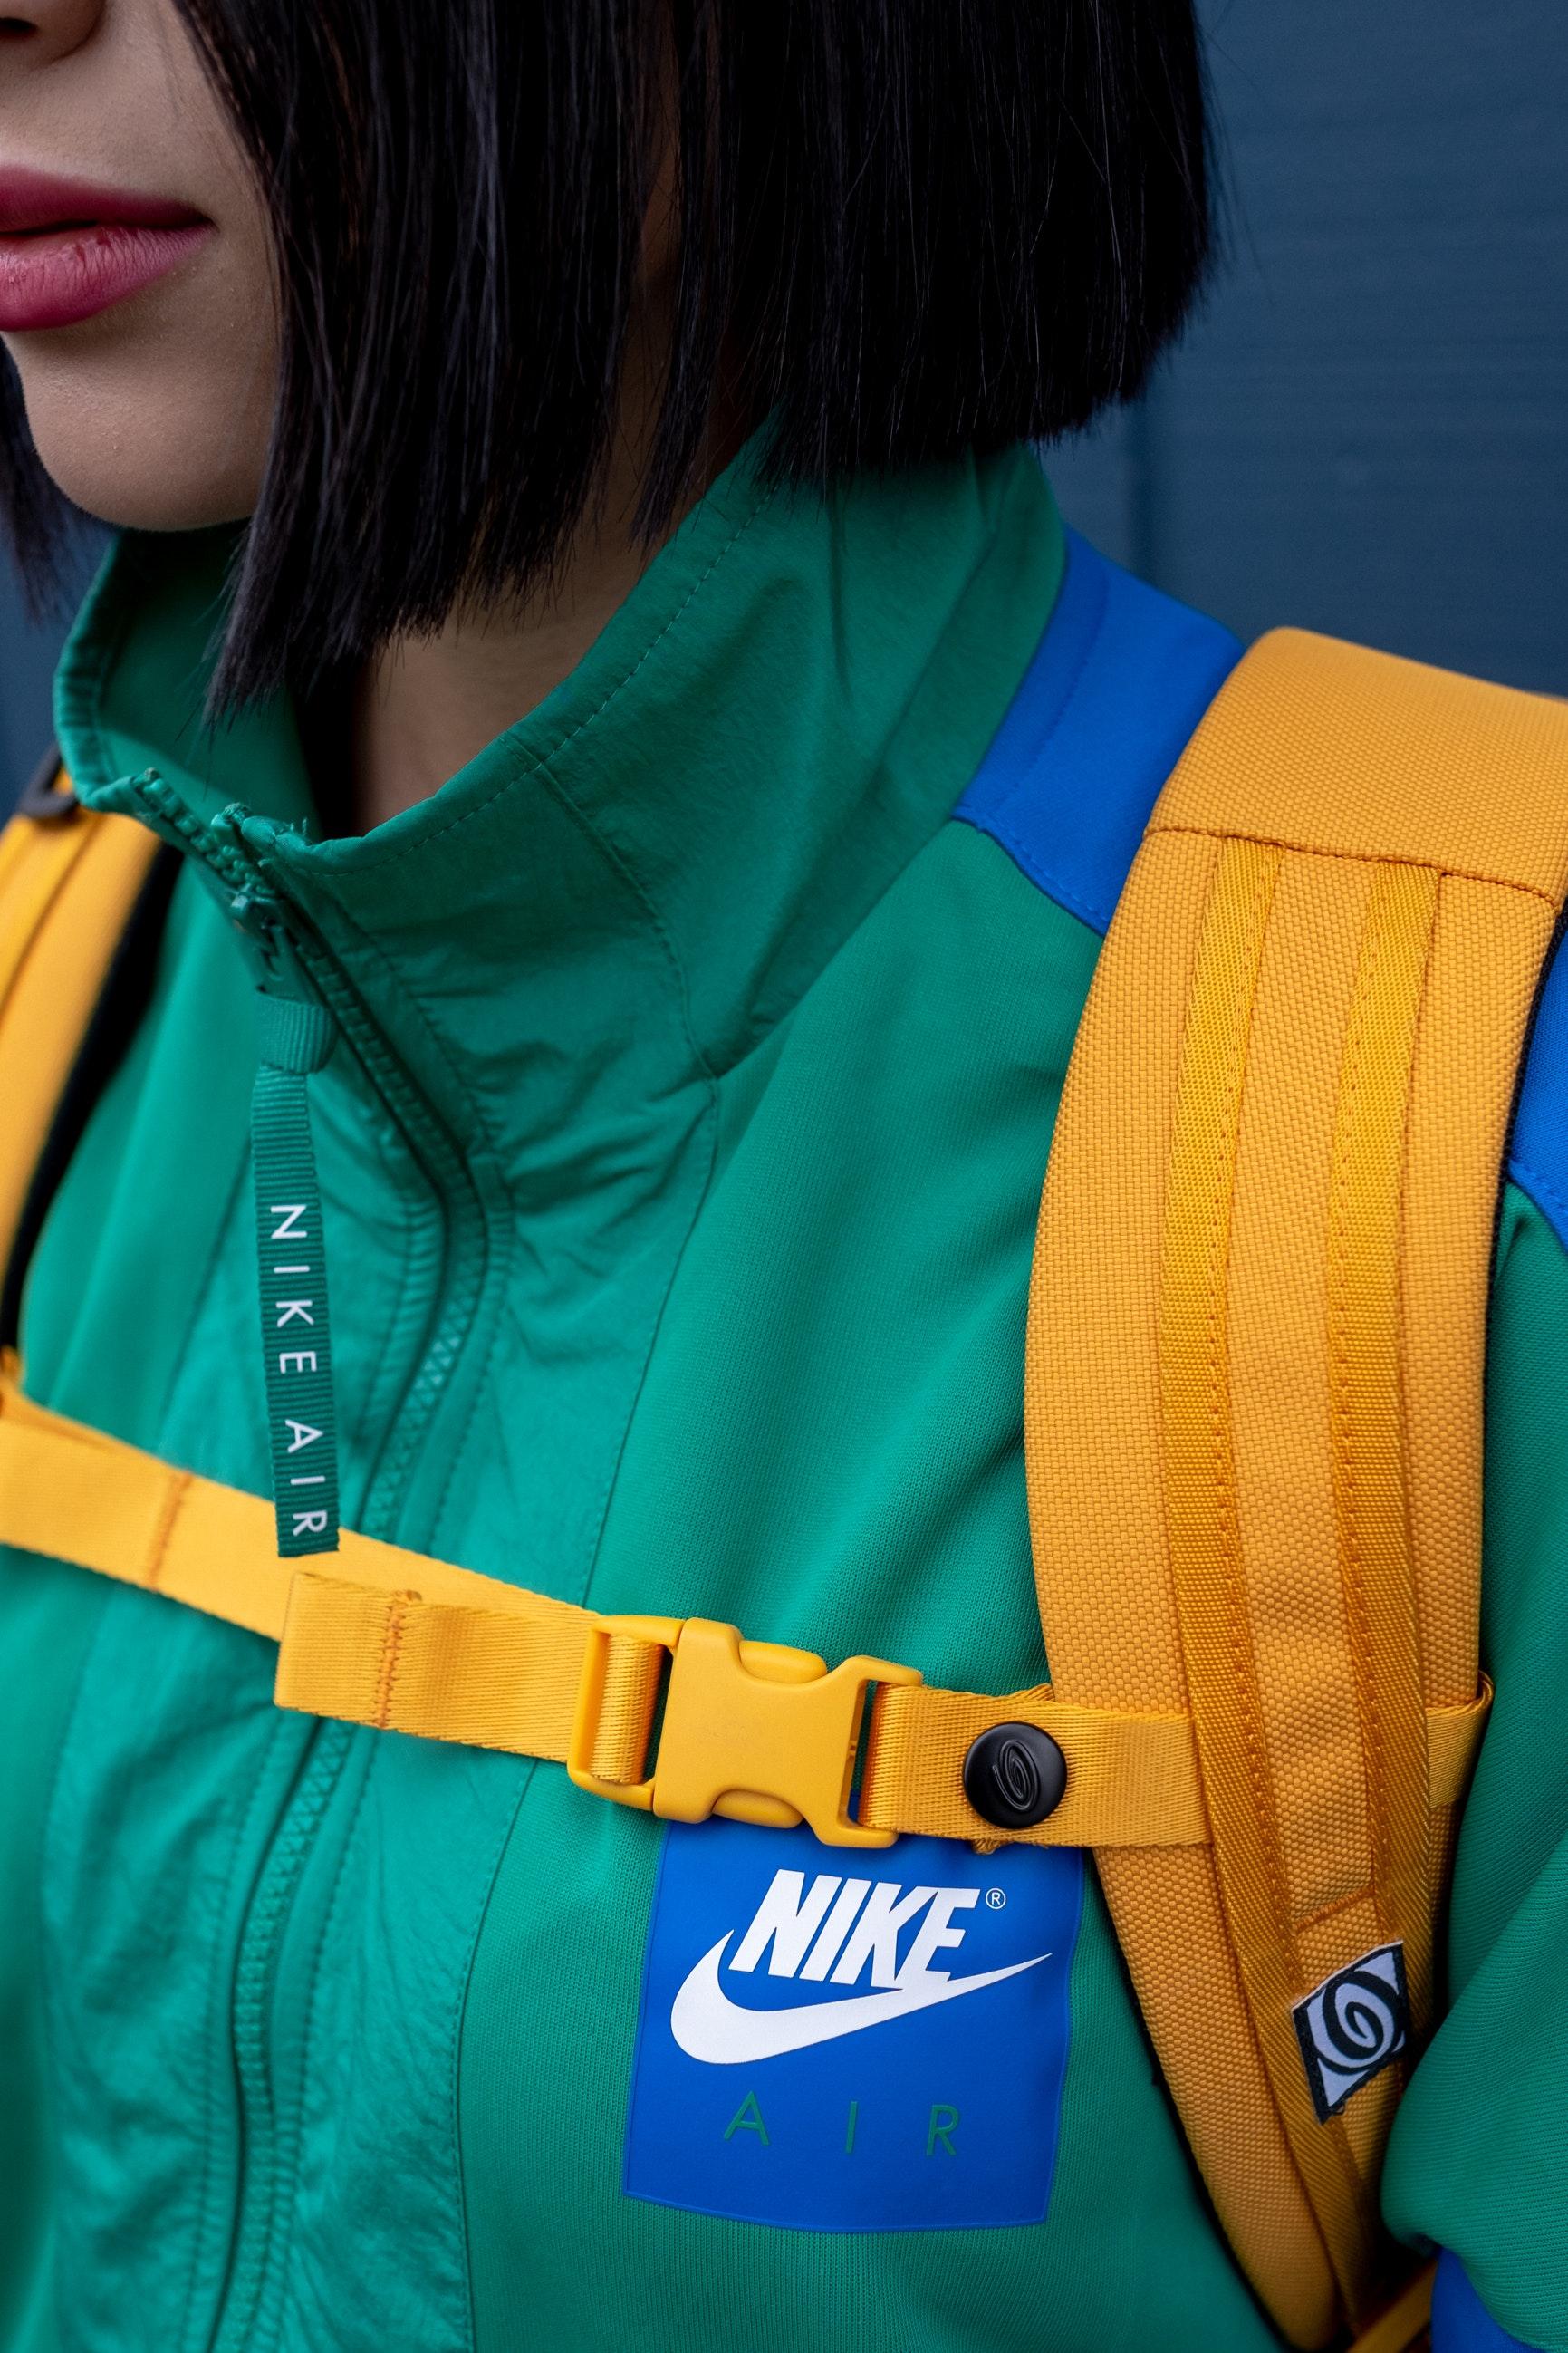 adult-backpack-brand-trademark-1890021.jpg